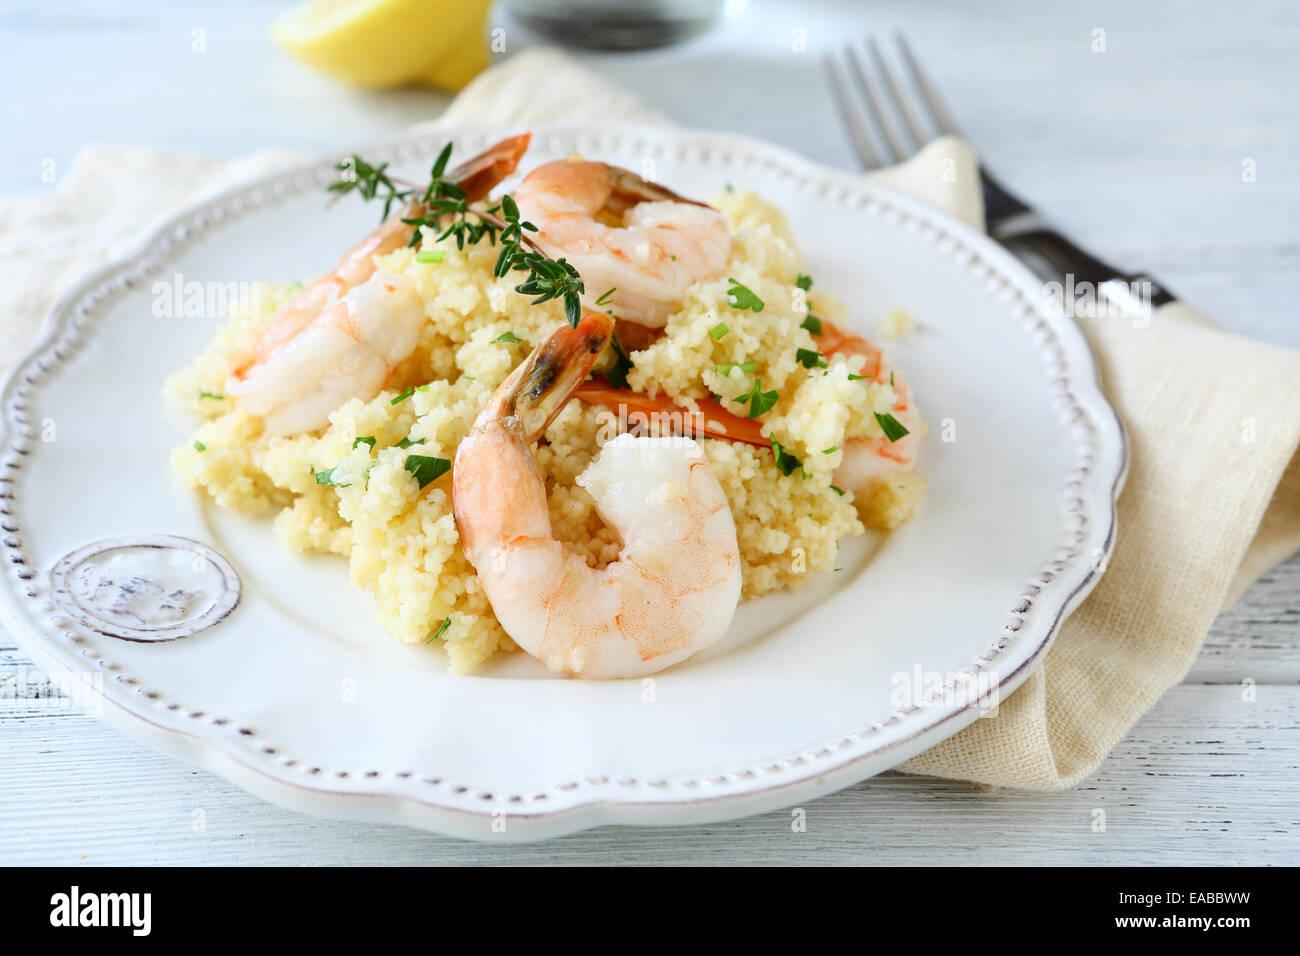 Leckere Couscous mit Shrimps, nahrhaftes Essen Stockbild